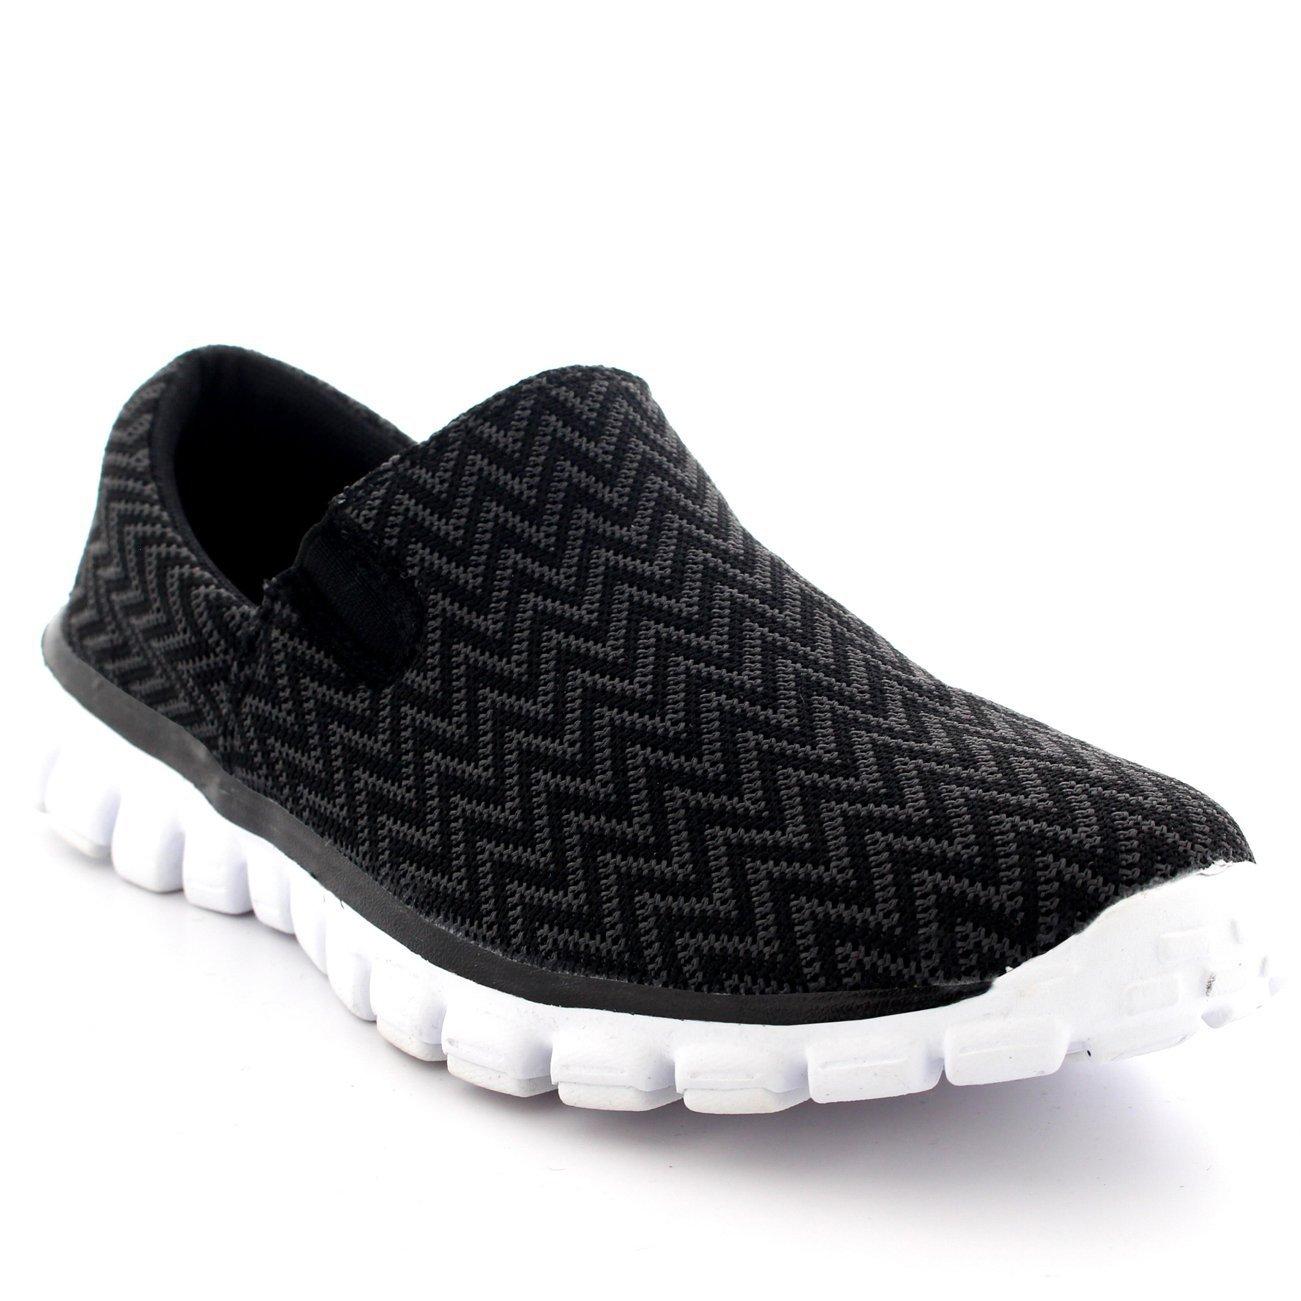 Mens Training Sports Gym Slip On Shoes Walking Office Running Sneakers B01BI4W9NC 10 D(M) US|Black/White